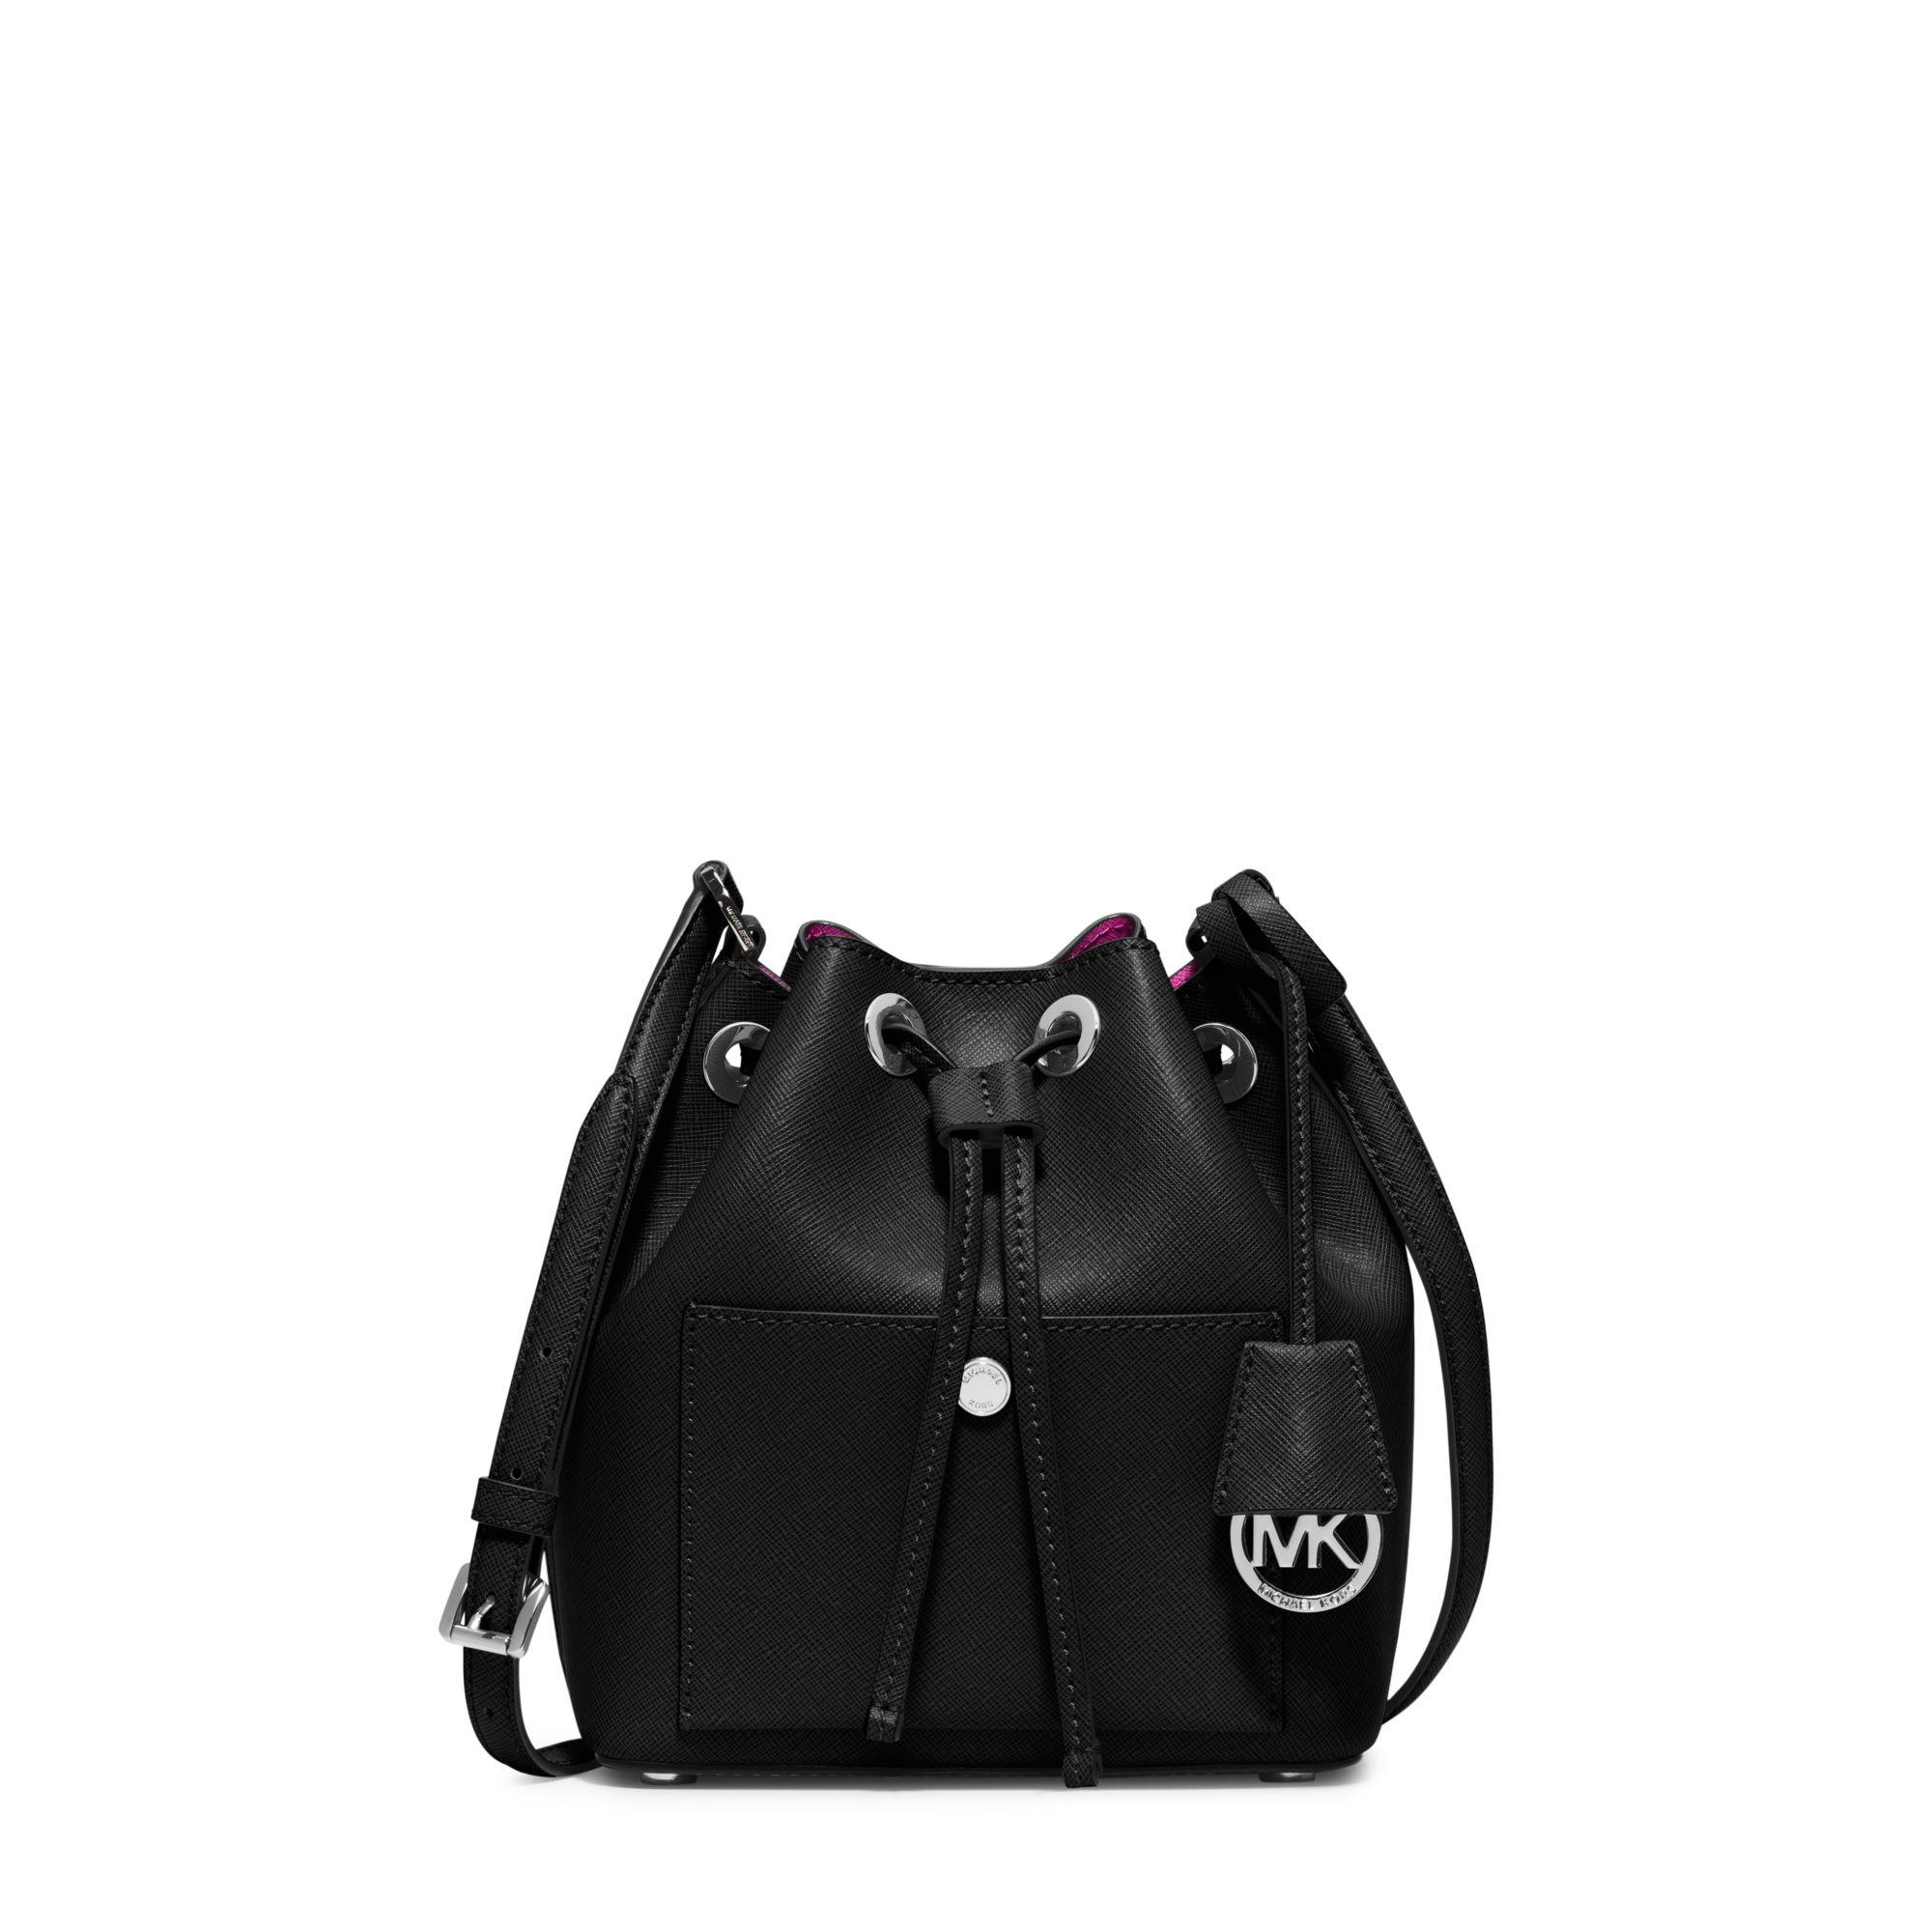 954875e39595 Lyst - Michael Kors Greenwich Saffiano-Leather Bucket Bag in Black